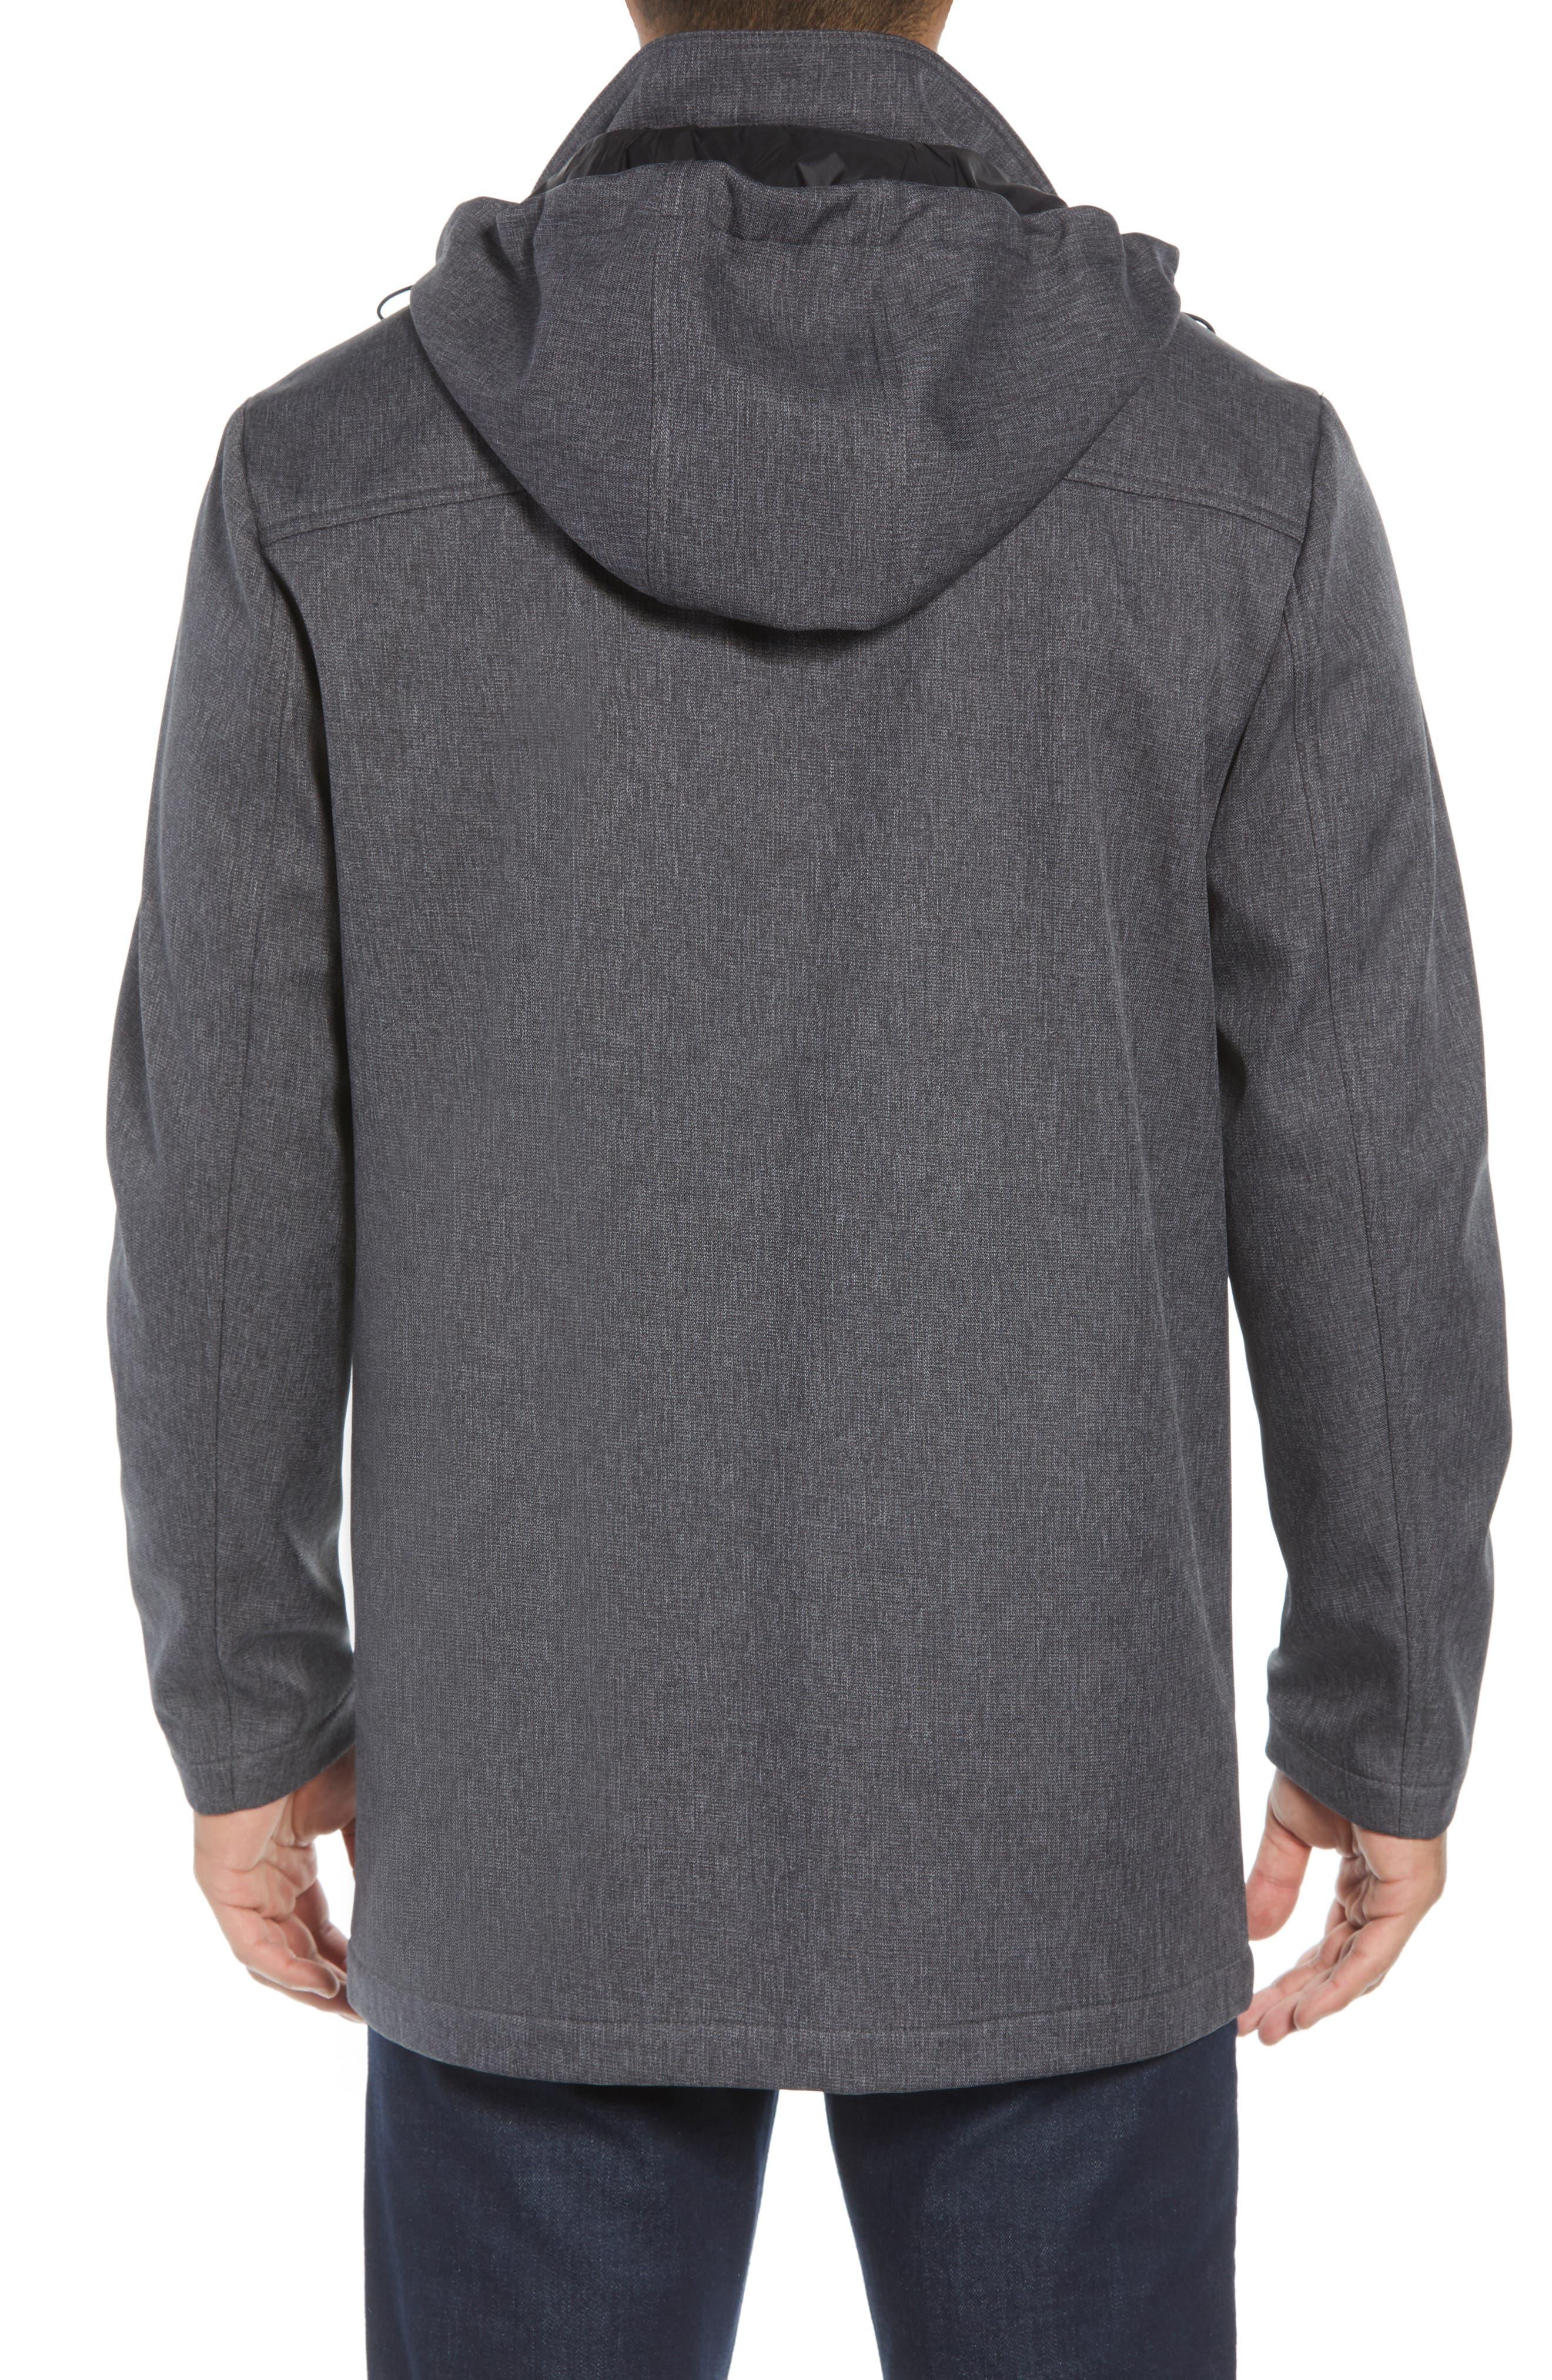 Doyle Soft Shell Jacket,                             Alternate thumbnail 2, color,                             001